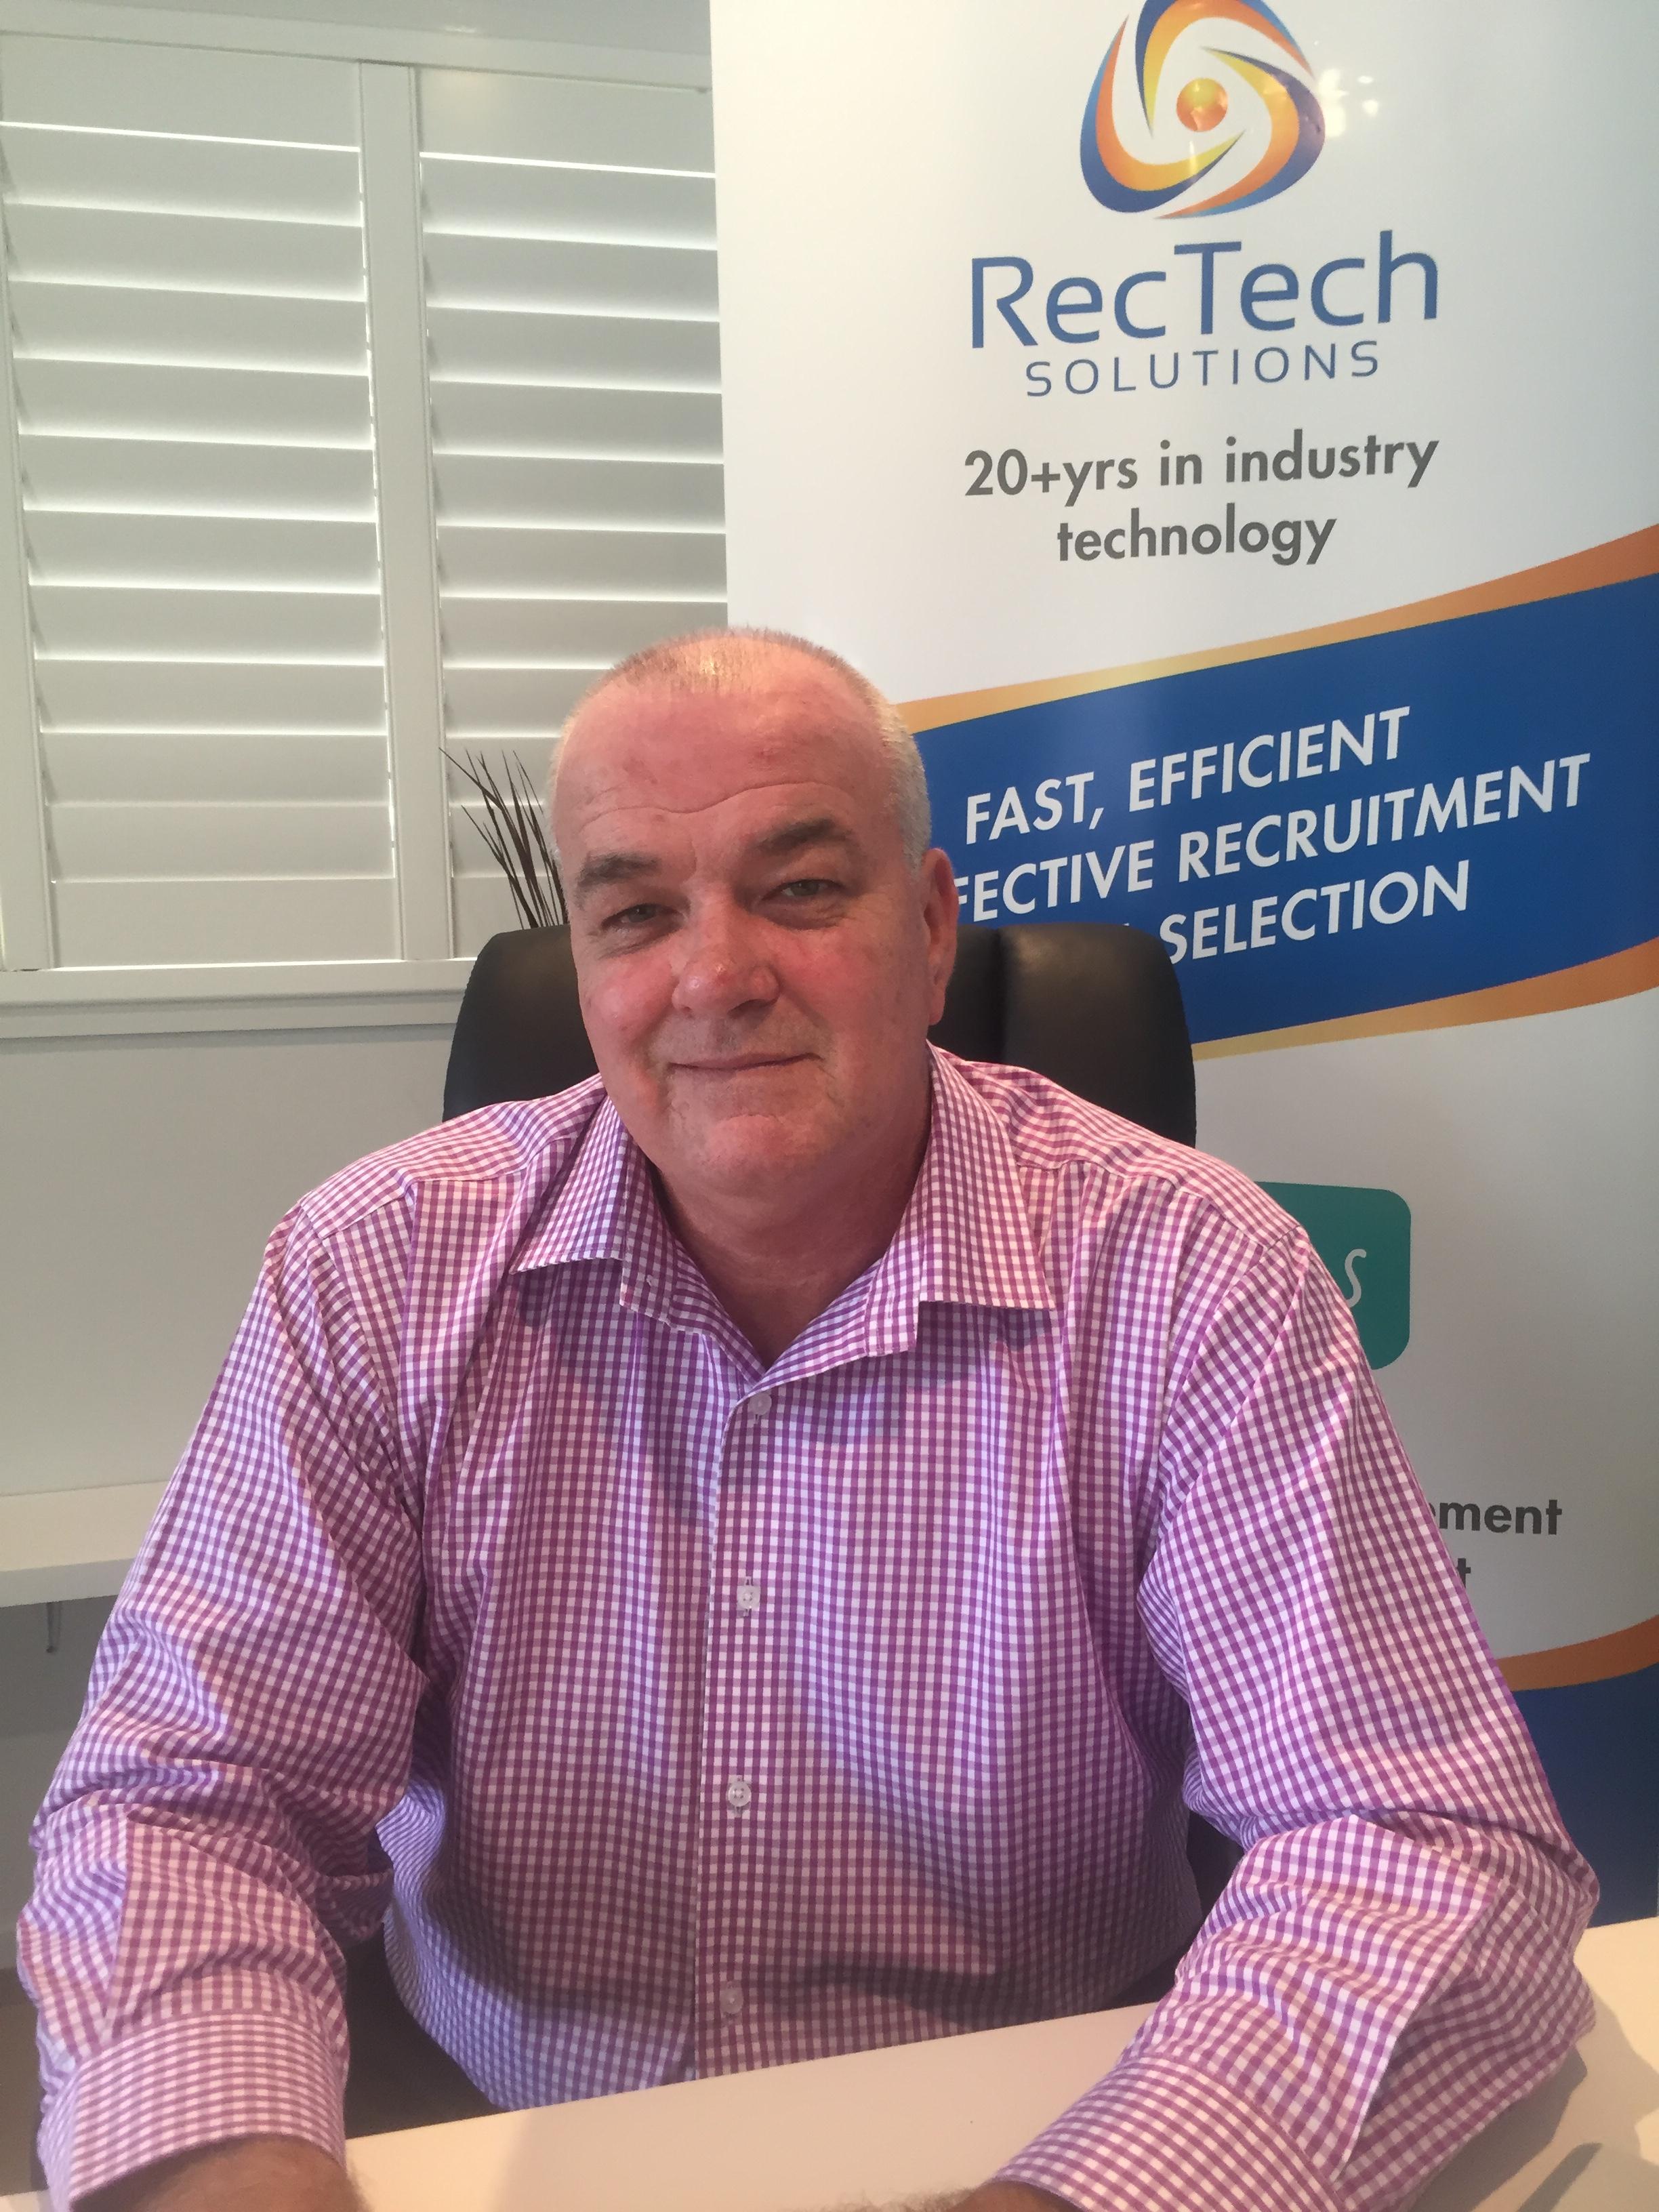 recruitment legislation acts